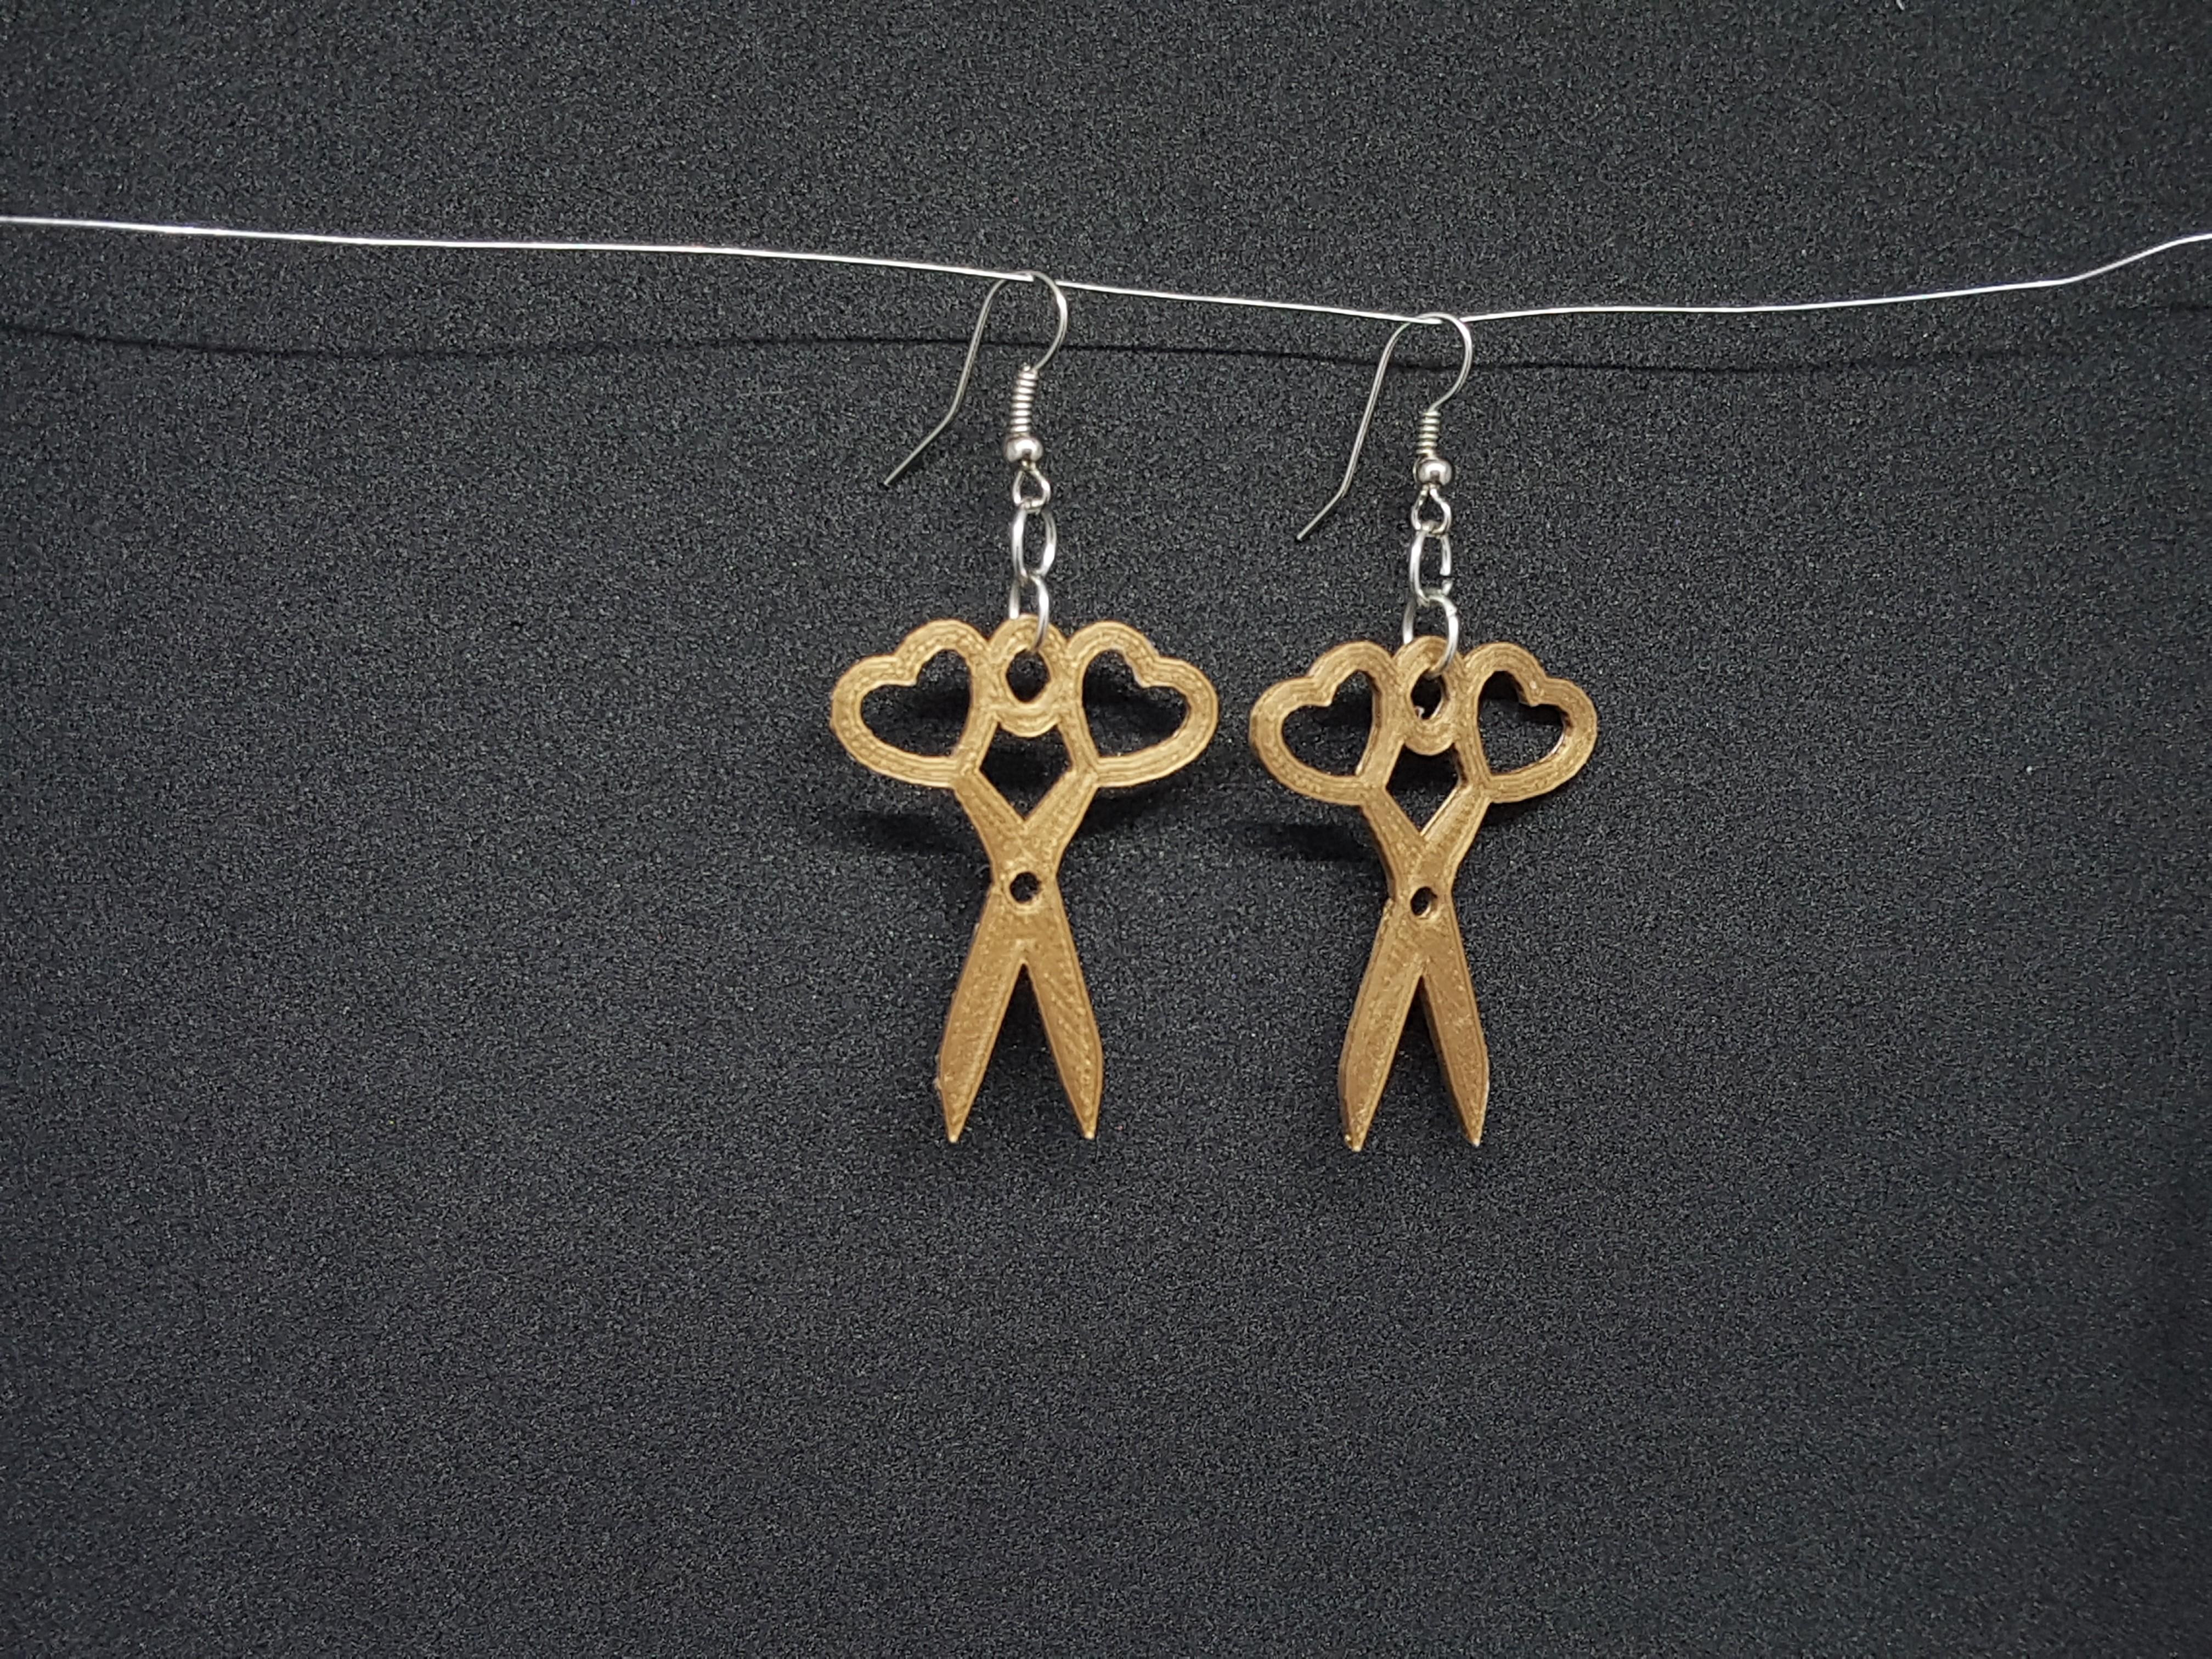 20180821_163529.jpg Download STL file earring and scissors pendant • 3D printing model, catf3d